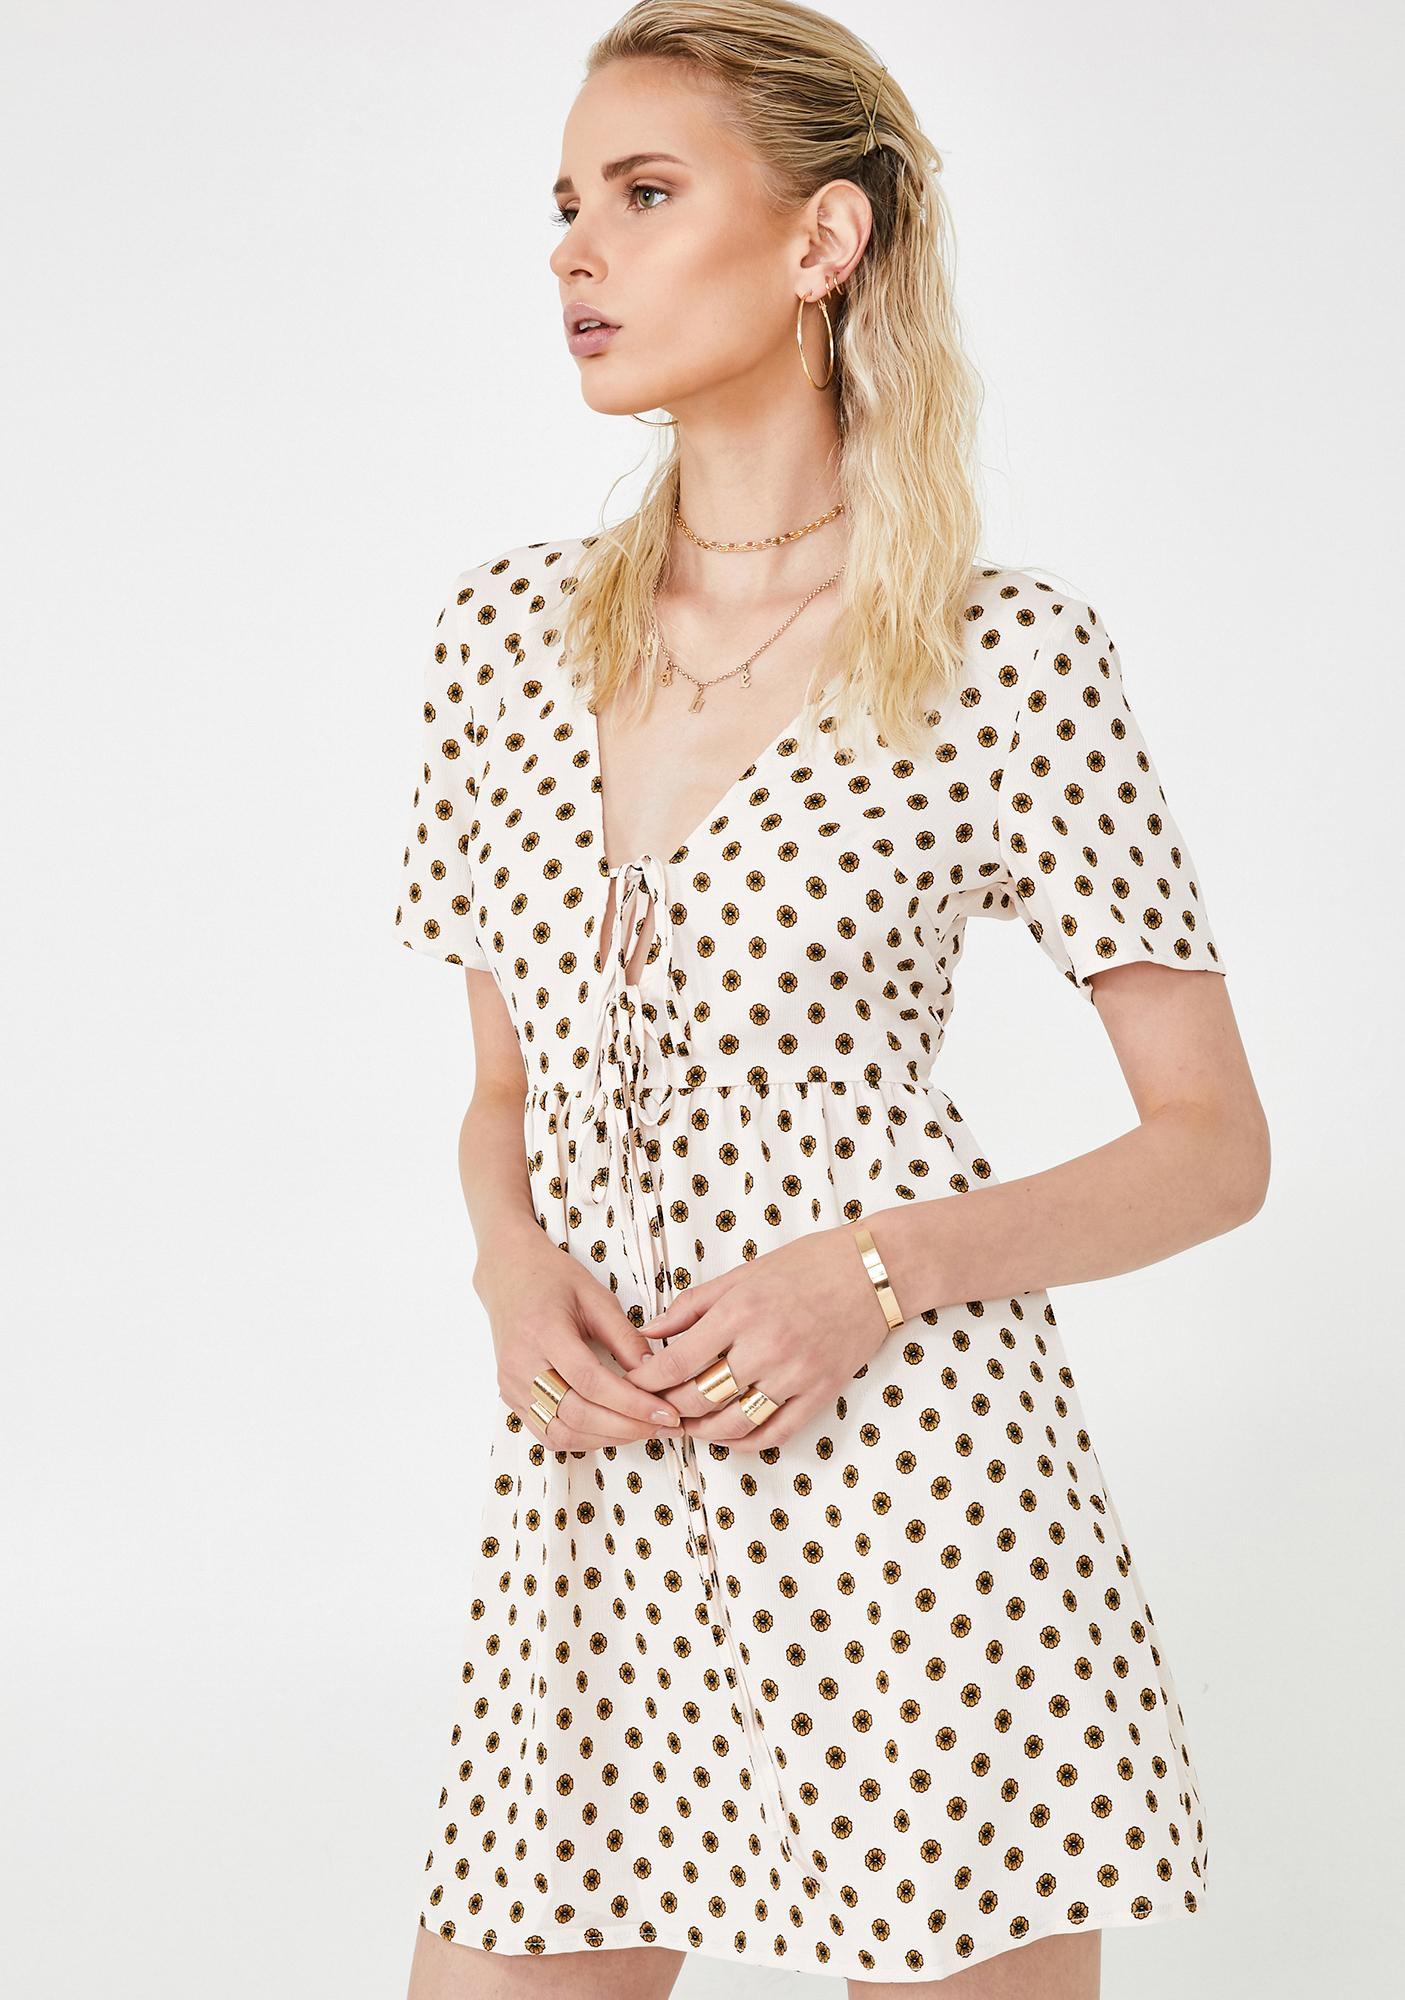 Glamorous Chic Life Polka Dot Dress